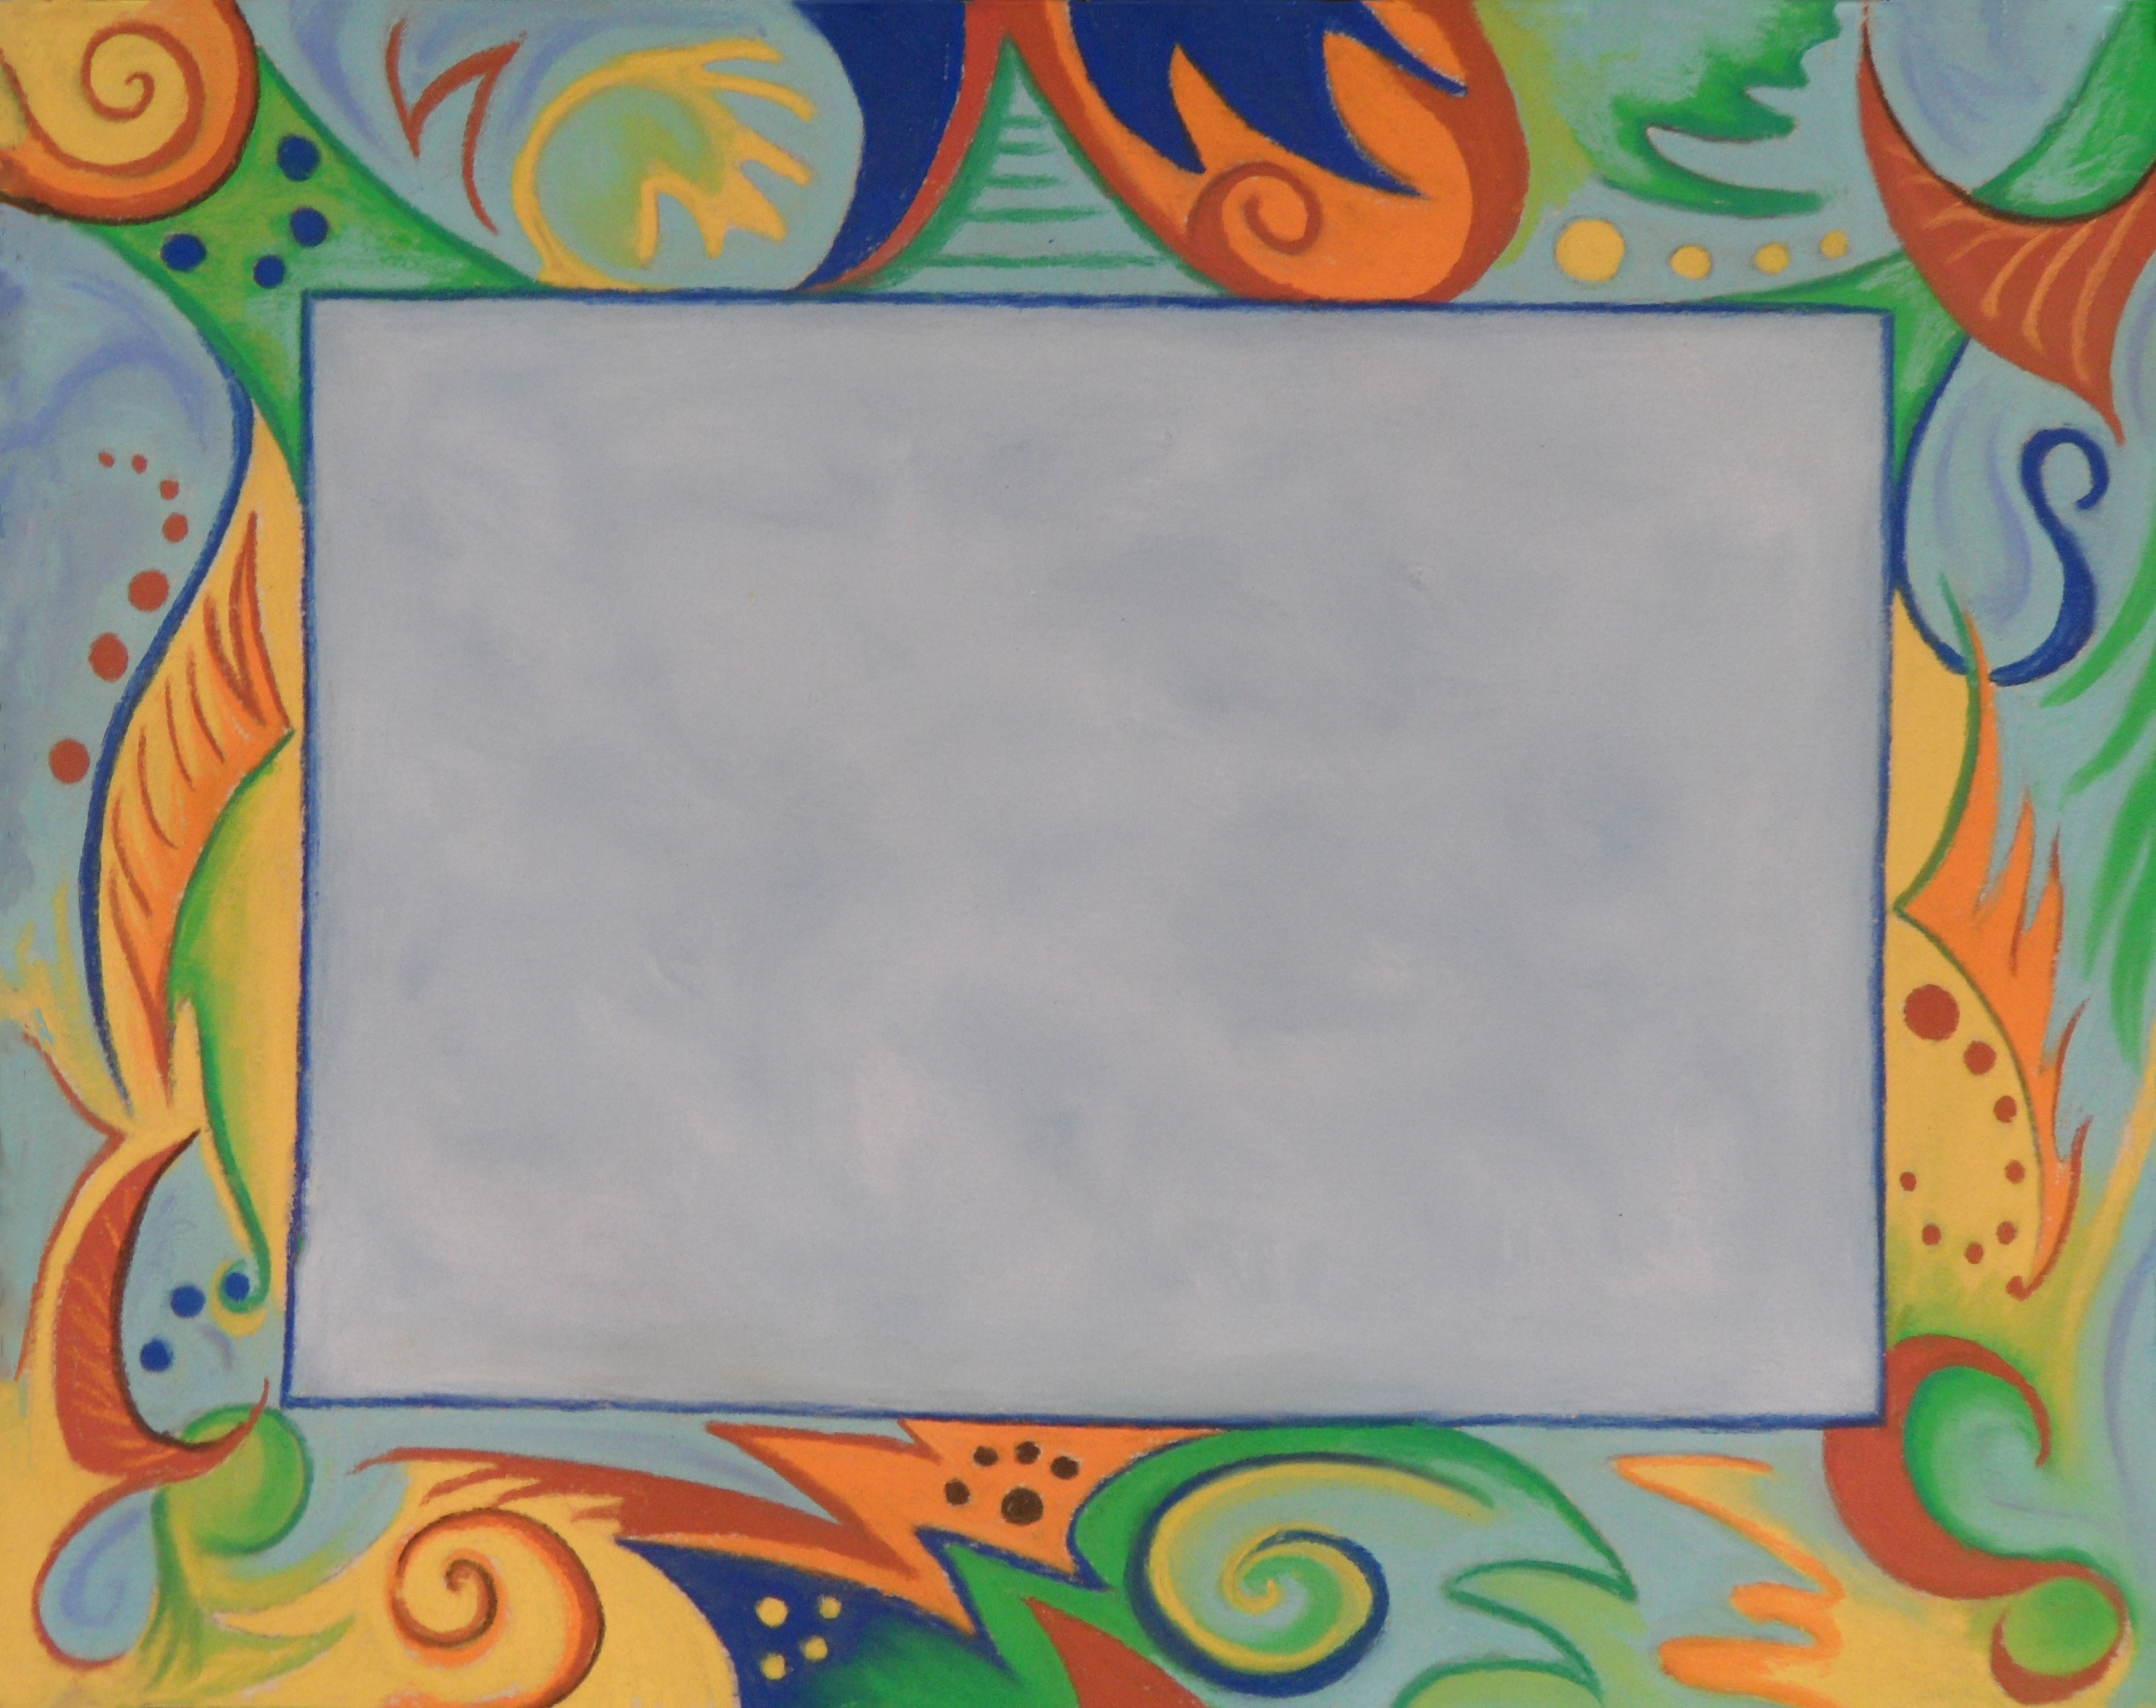 2-6-14 kids and art portfolio 043.jpg